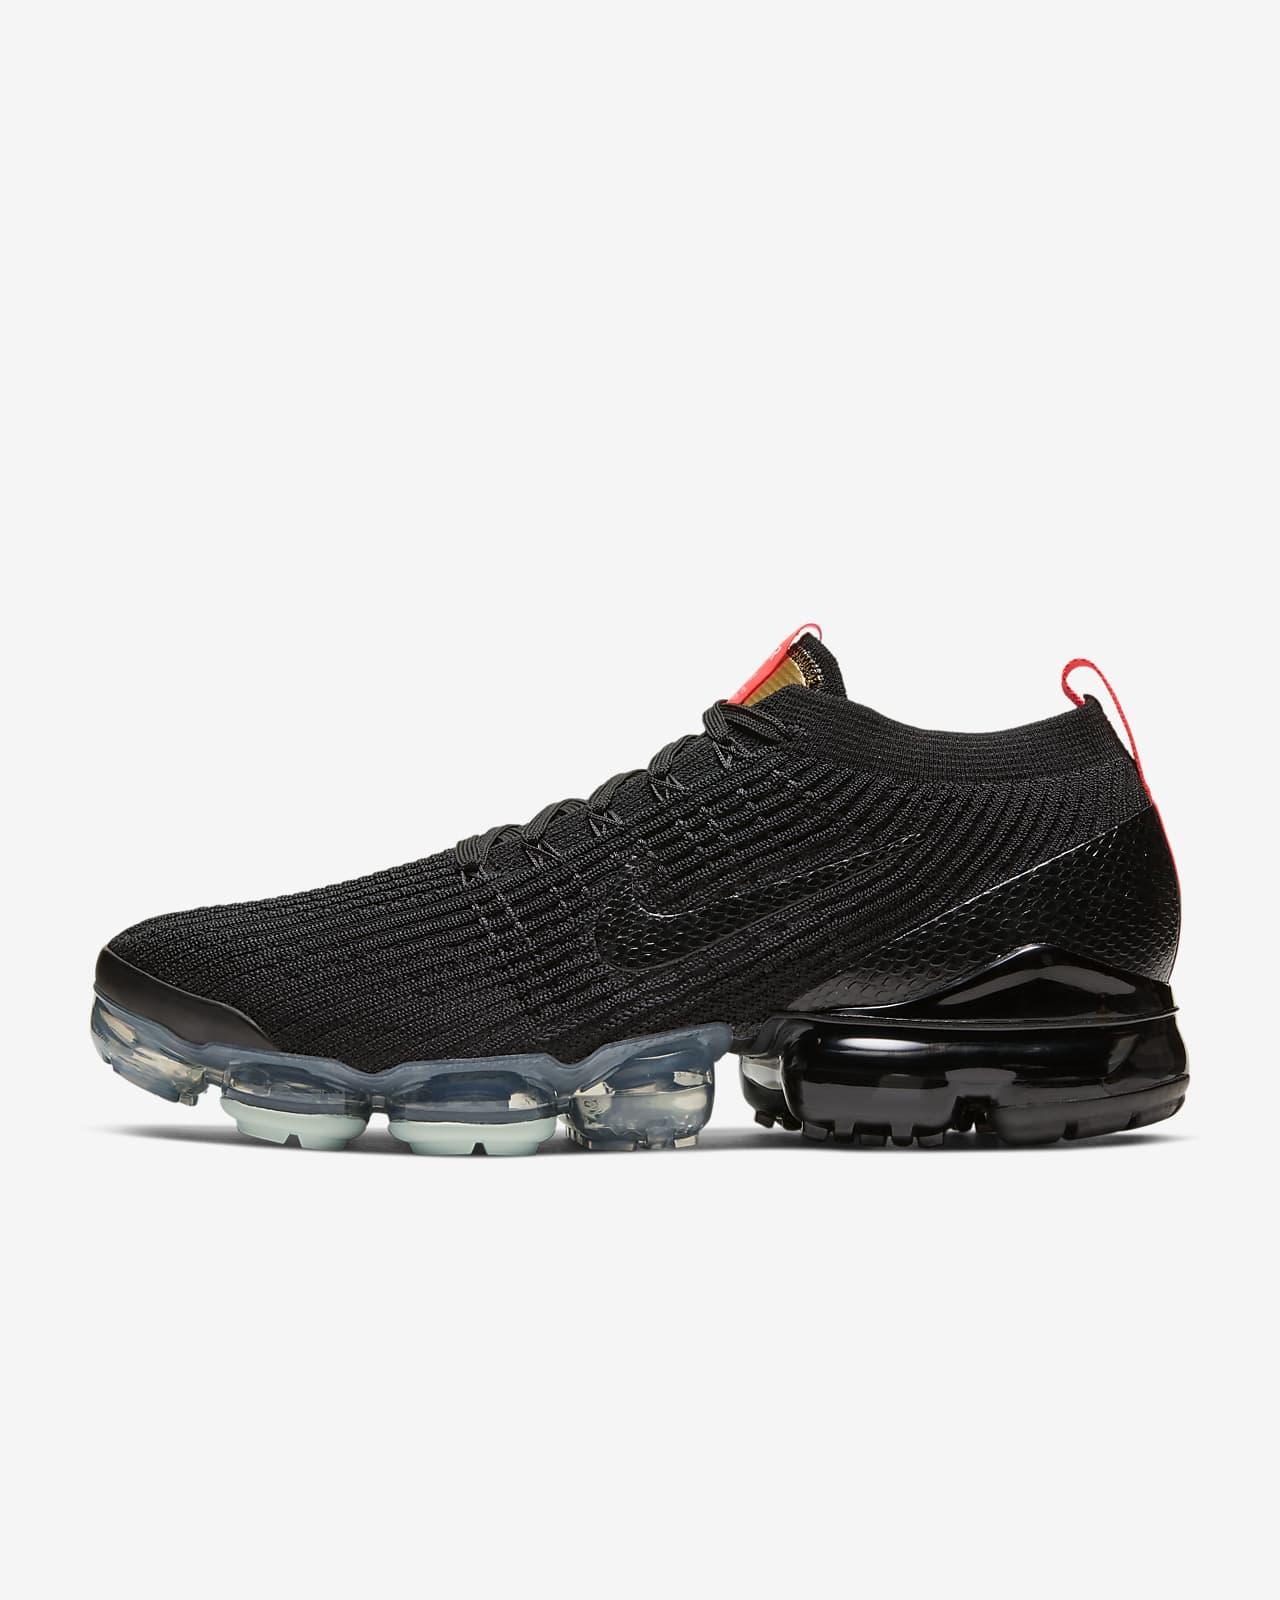 Convocar alondra estoy enfermo  Nike Air VaporMax Flyknit 3 Men's Shoe. Nike.com